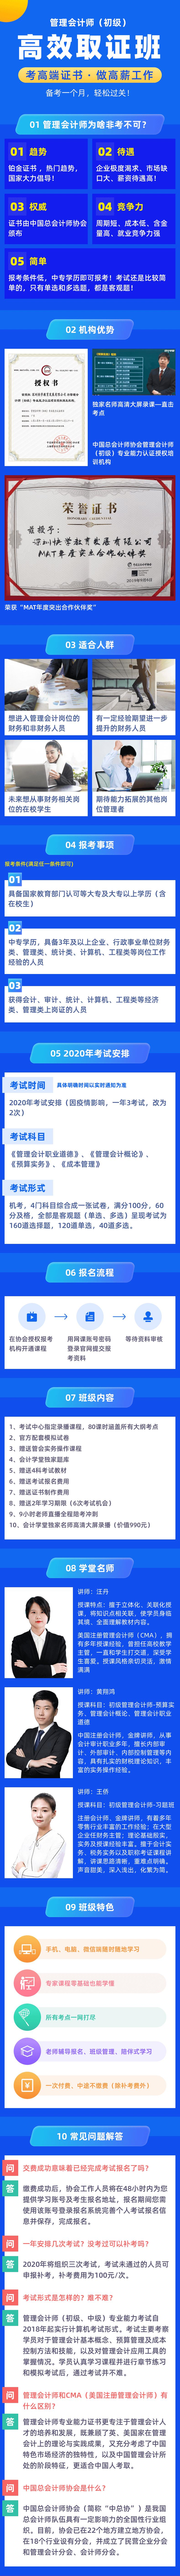 0c18f542d9cd9dc01bd1de94a9e72928__5f4861b4d10b7(2).png